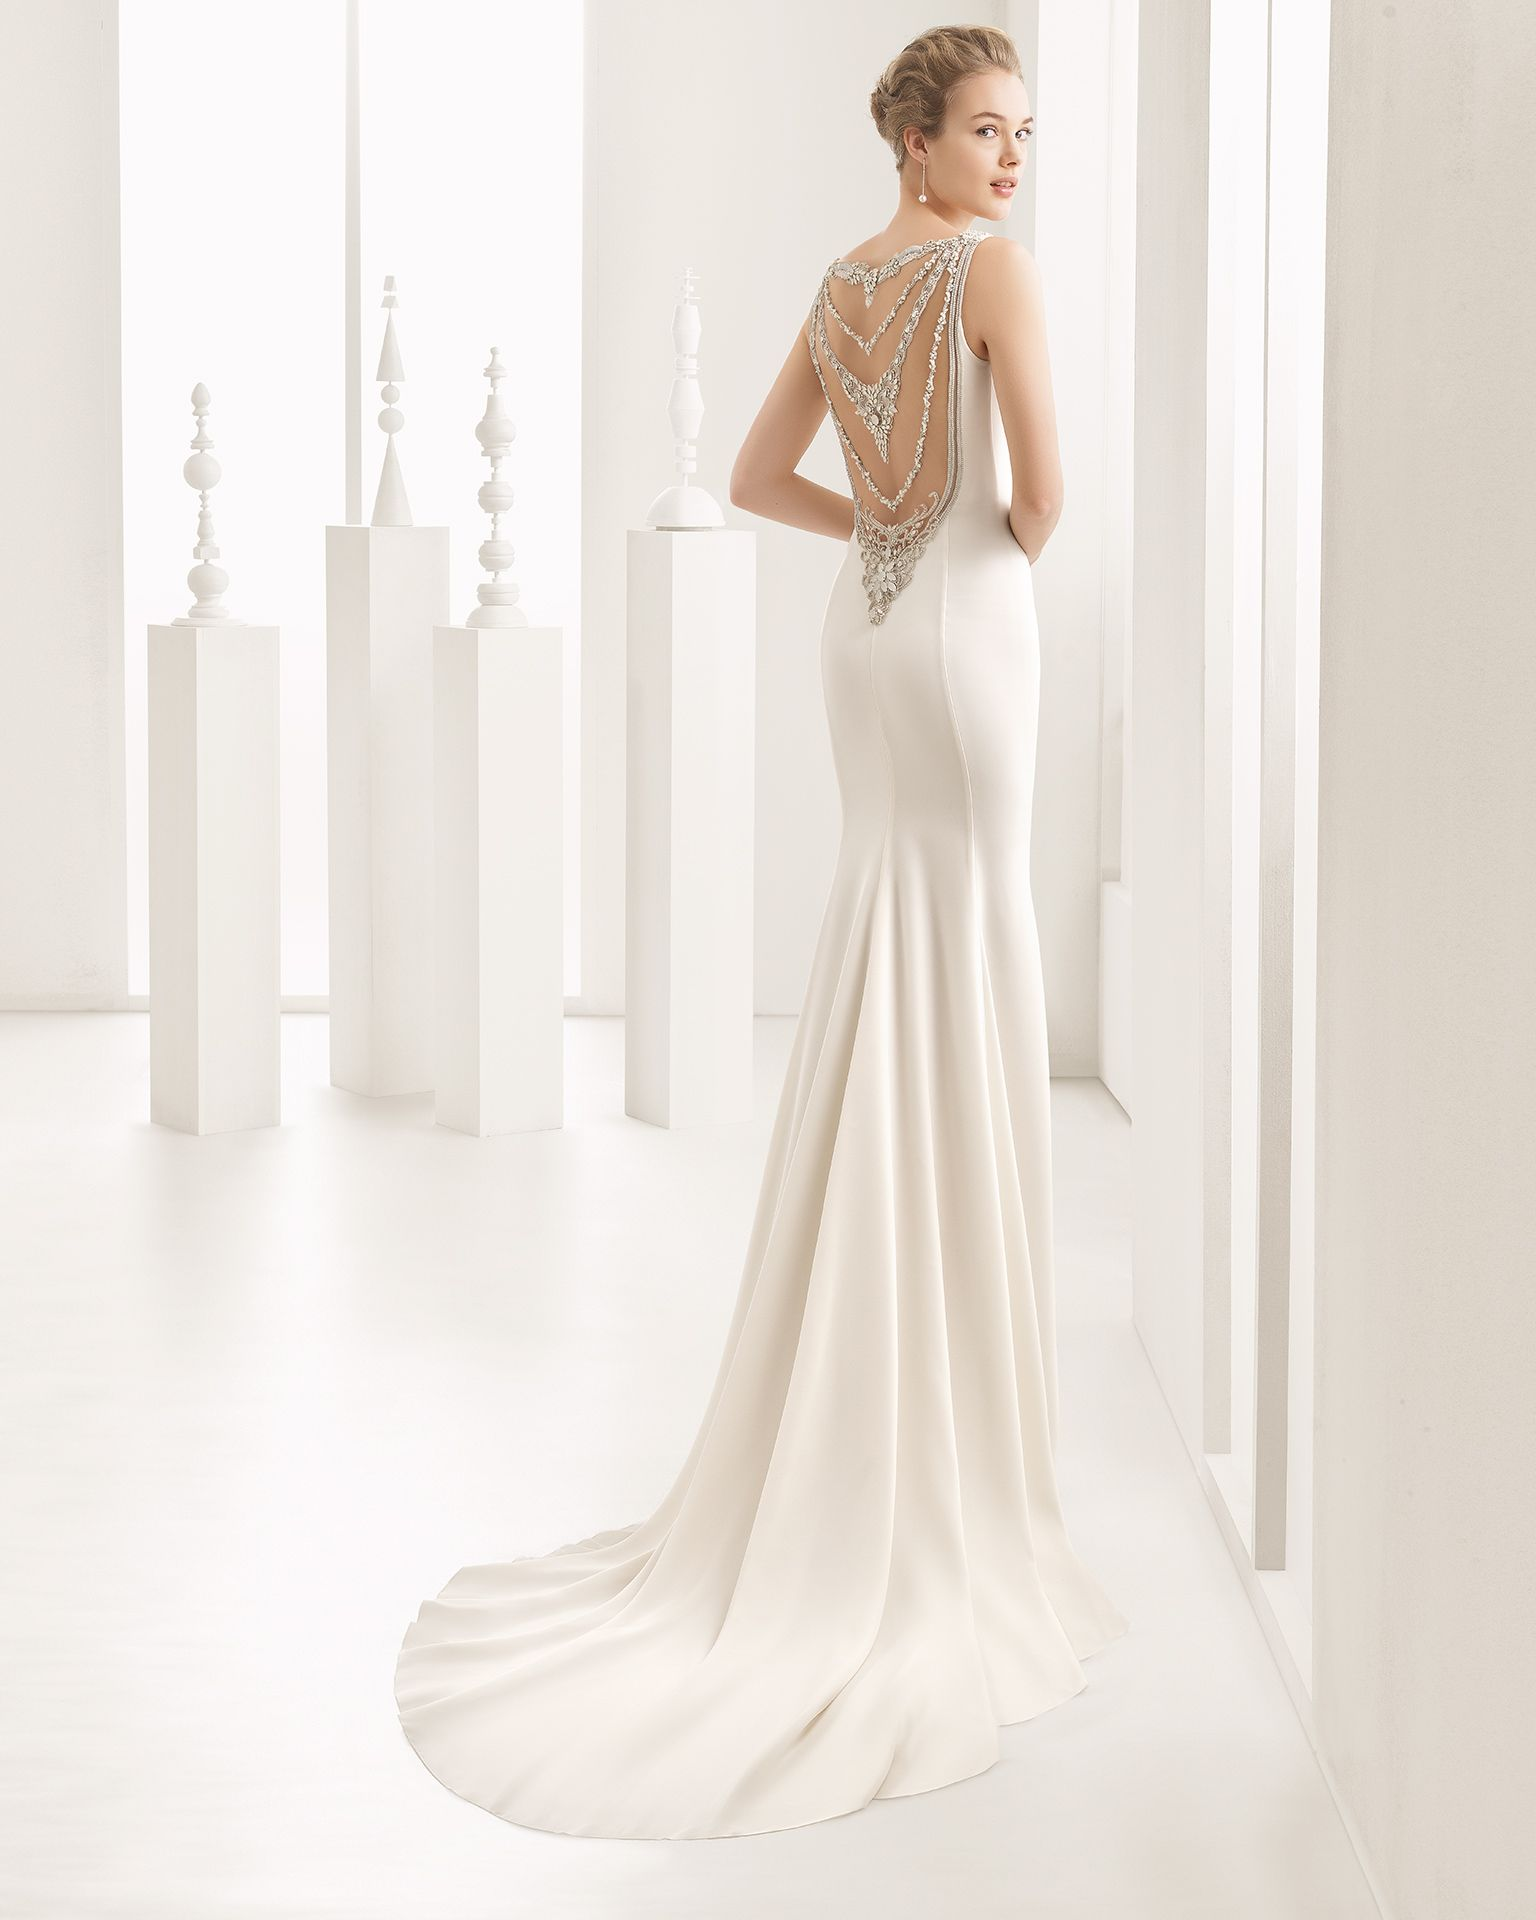 Naisha - 2017 Bridal Collection. Rosa Clará. | Pinterest | Wedding ...